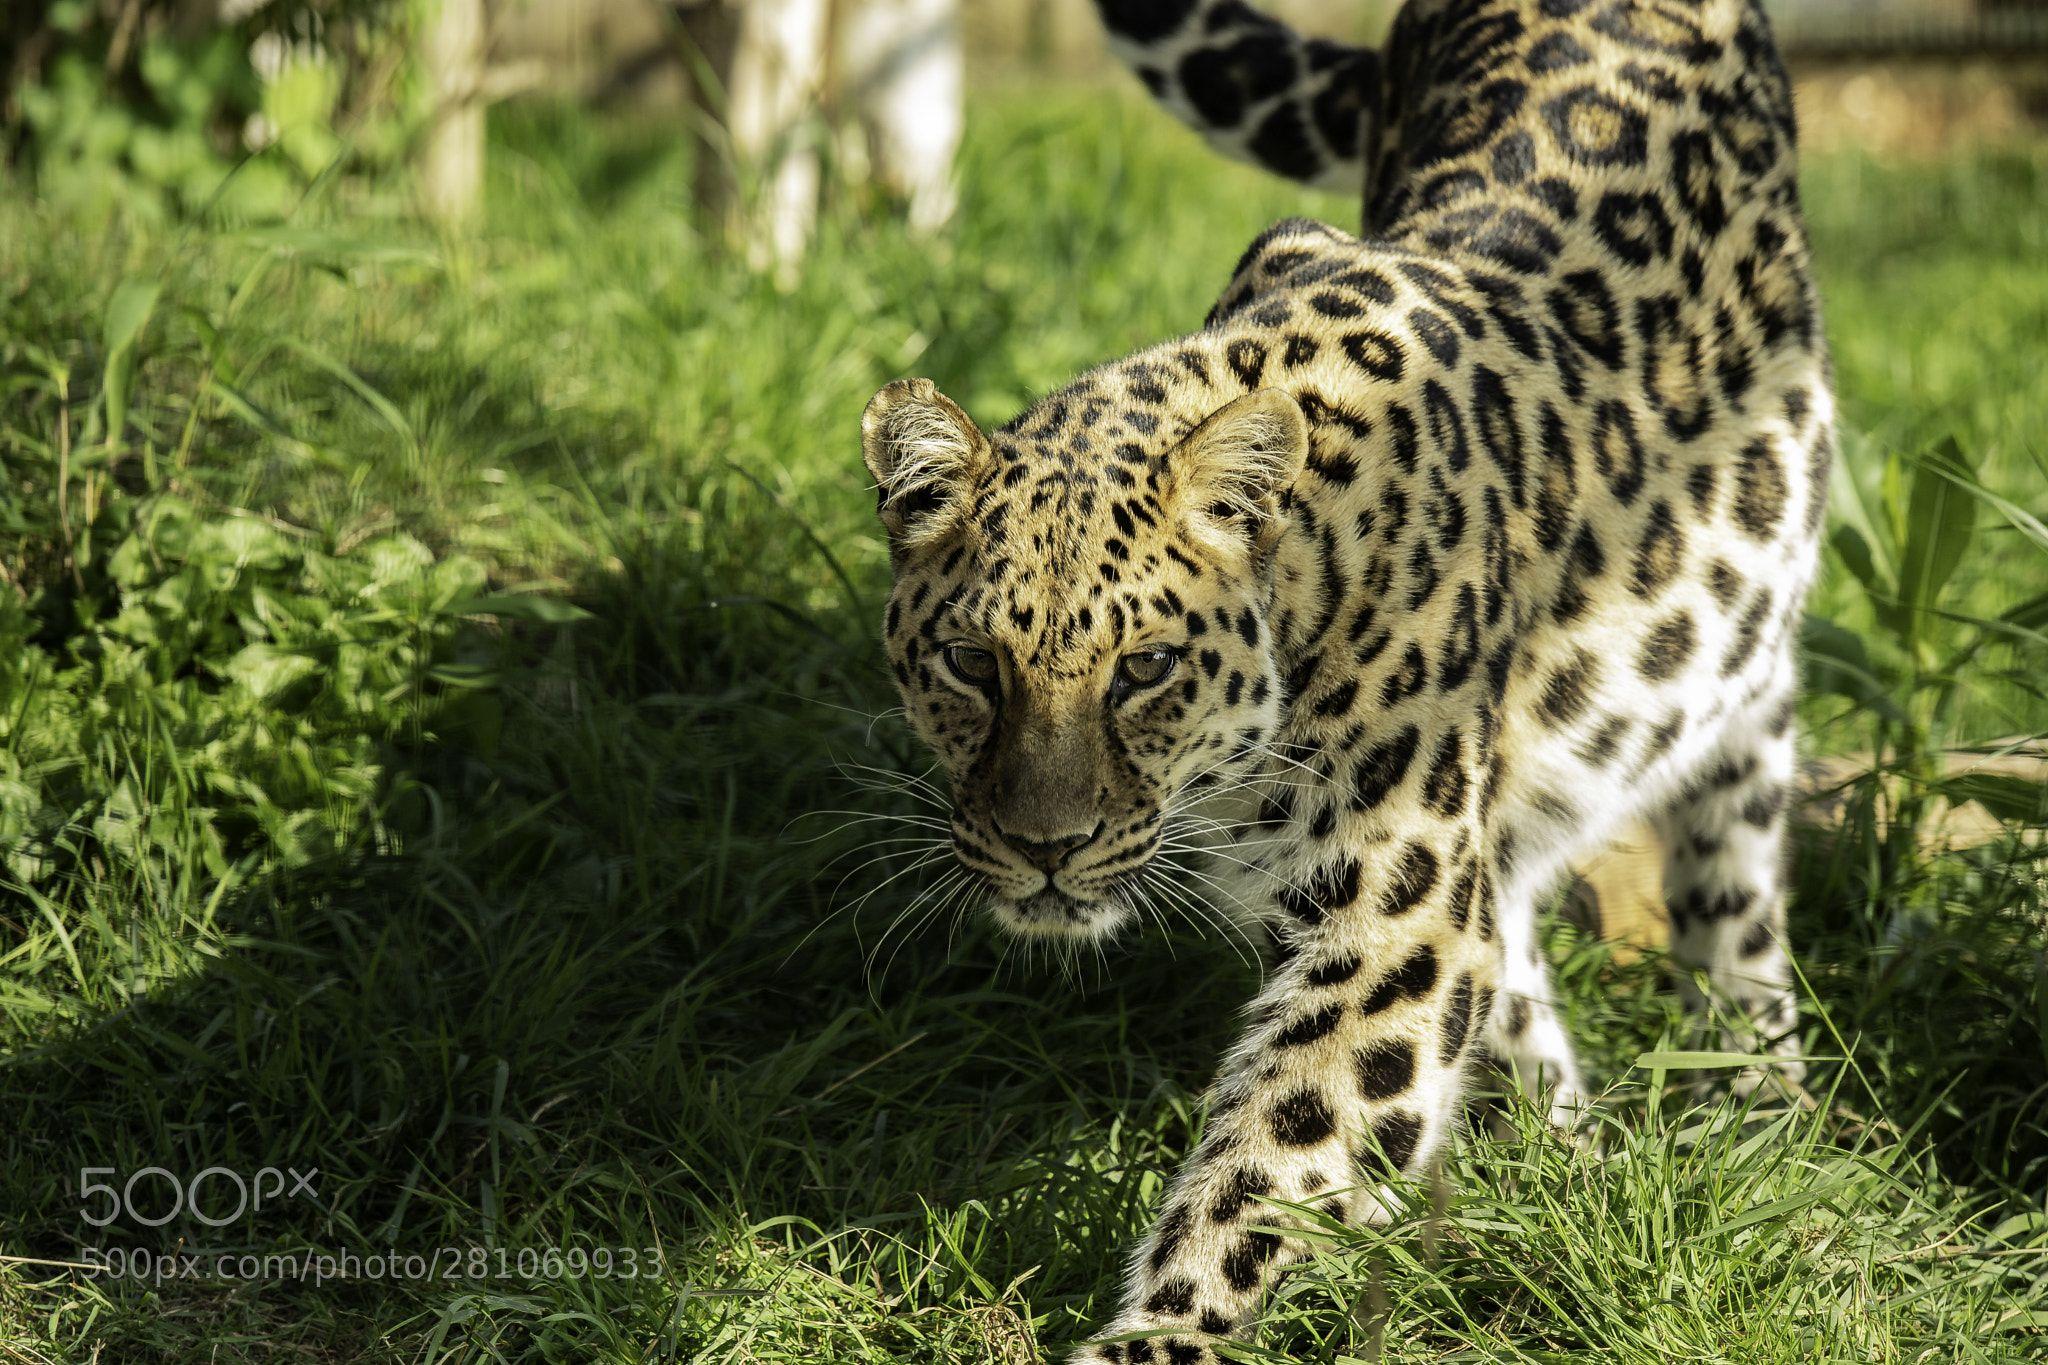 Amur Leopard SeriesTaken at The Big Cat Sanctuary in Kent